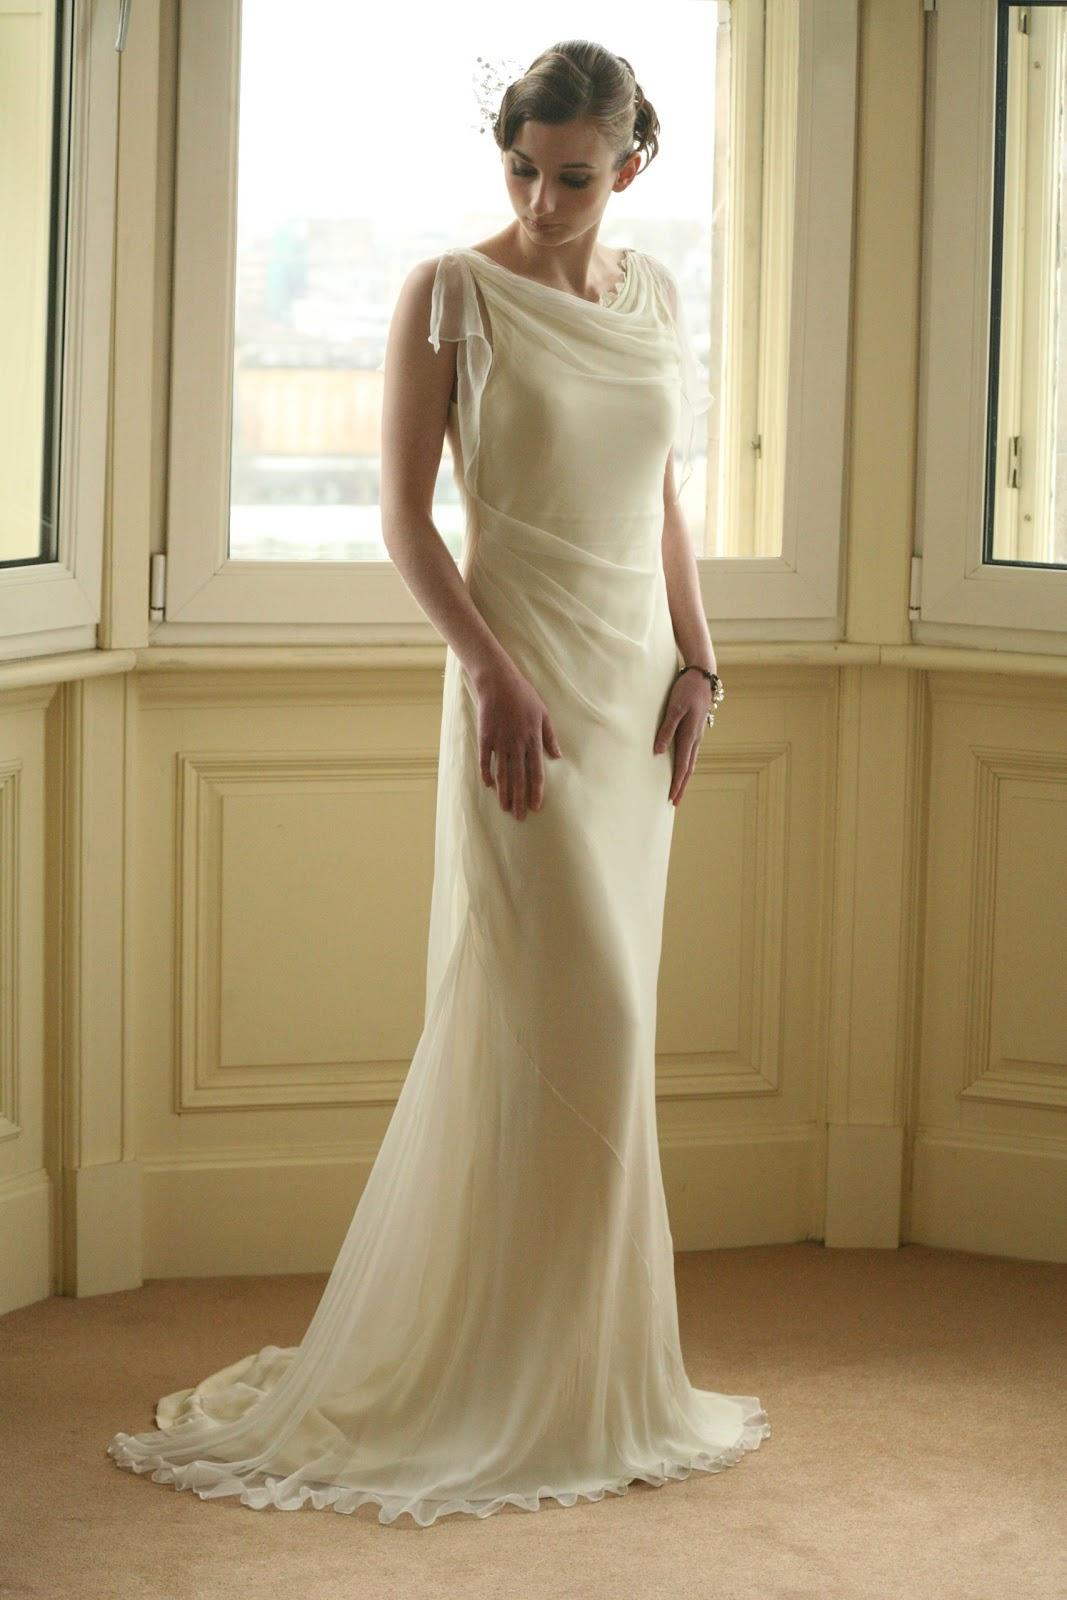 40s style amanda douglas events winnipeg event planner for 40s style wedding dresses